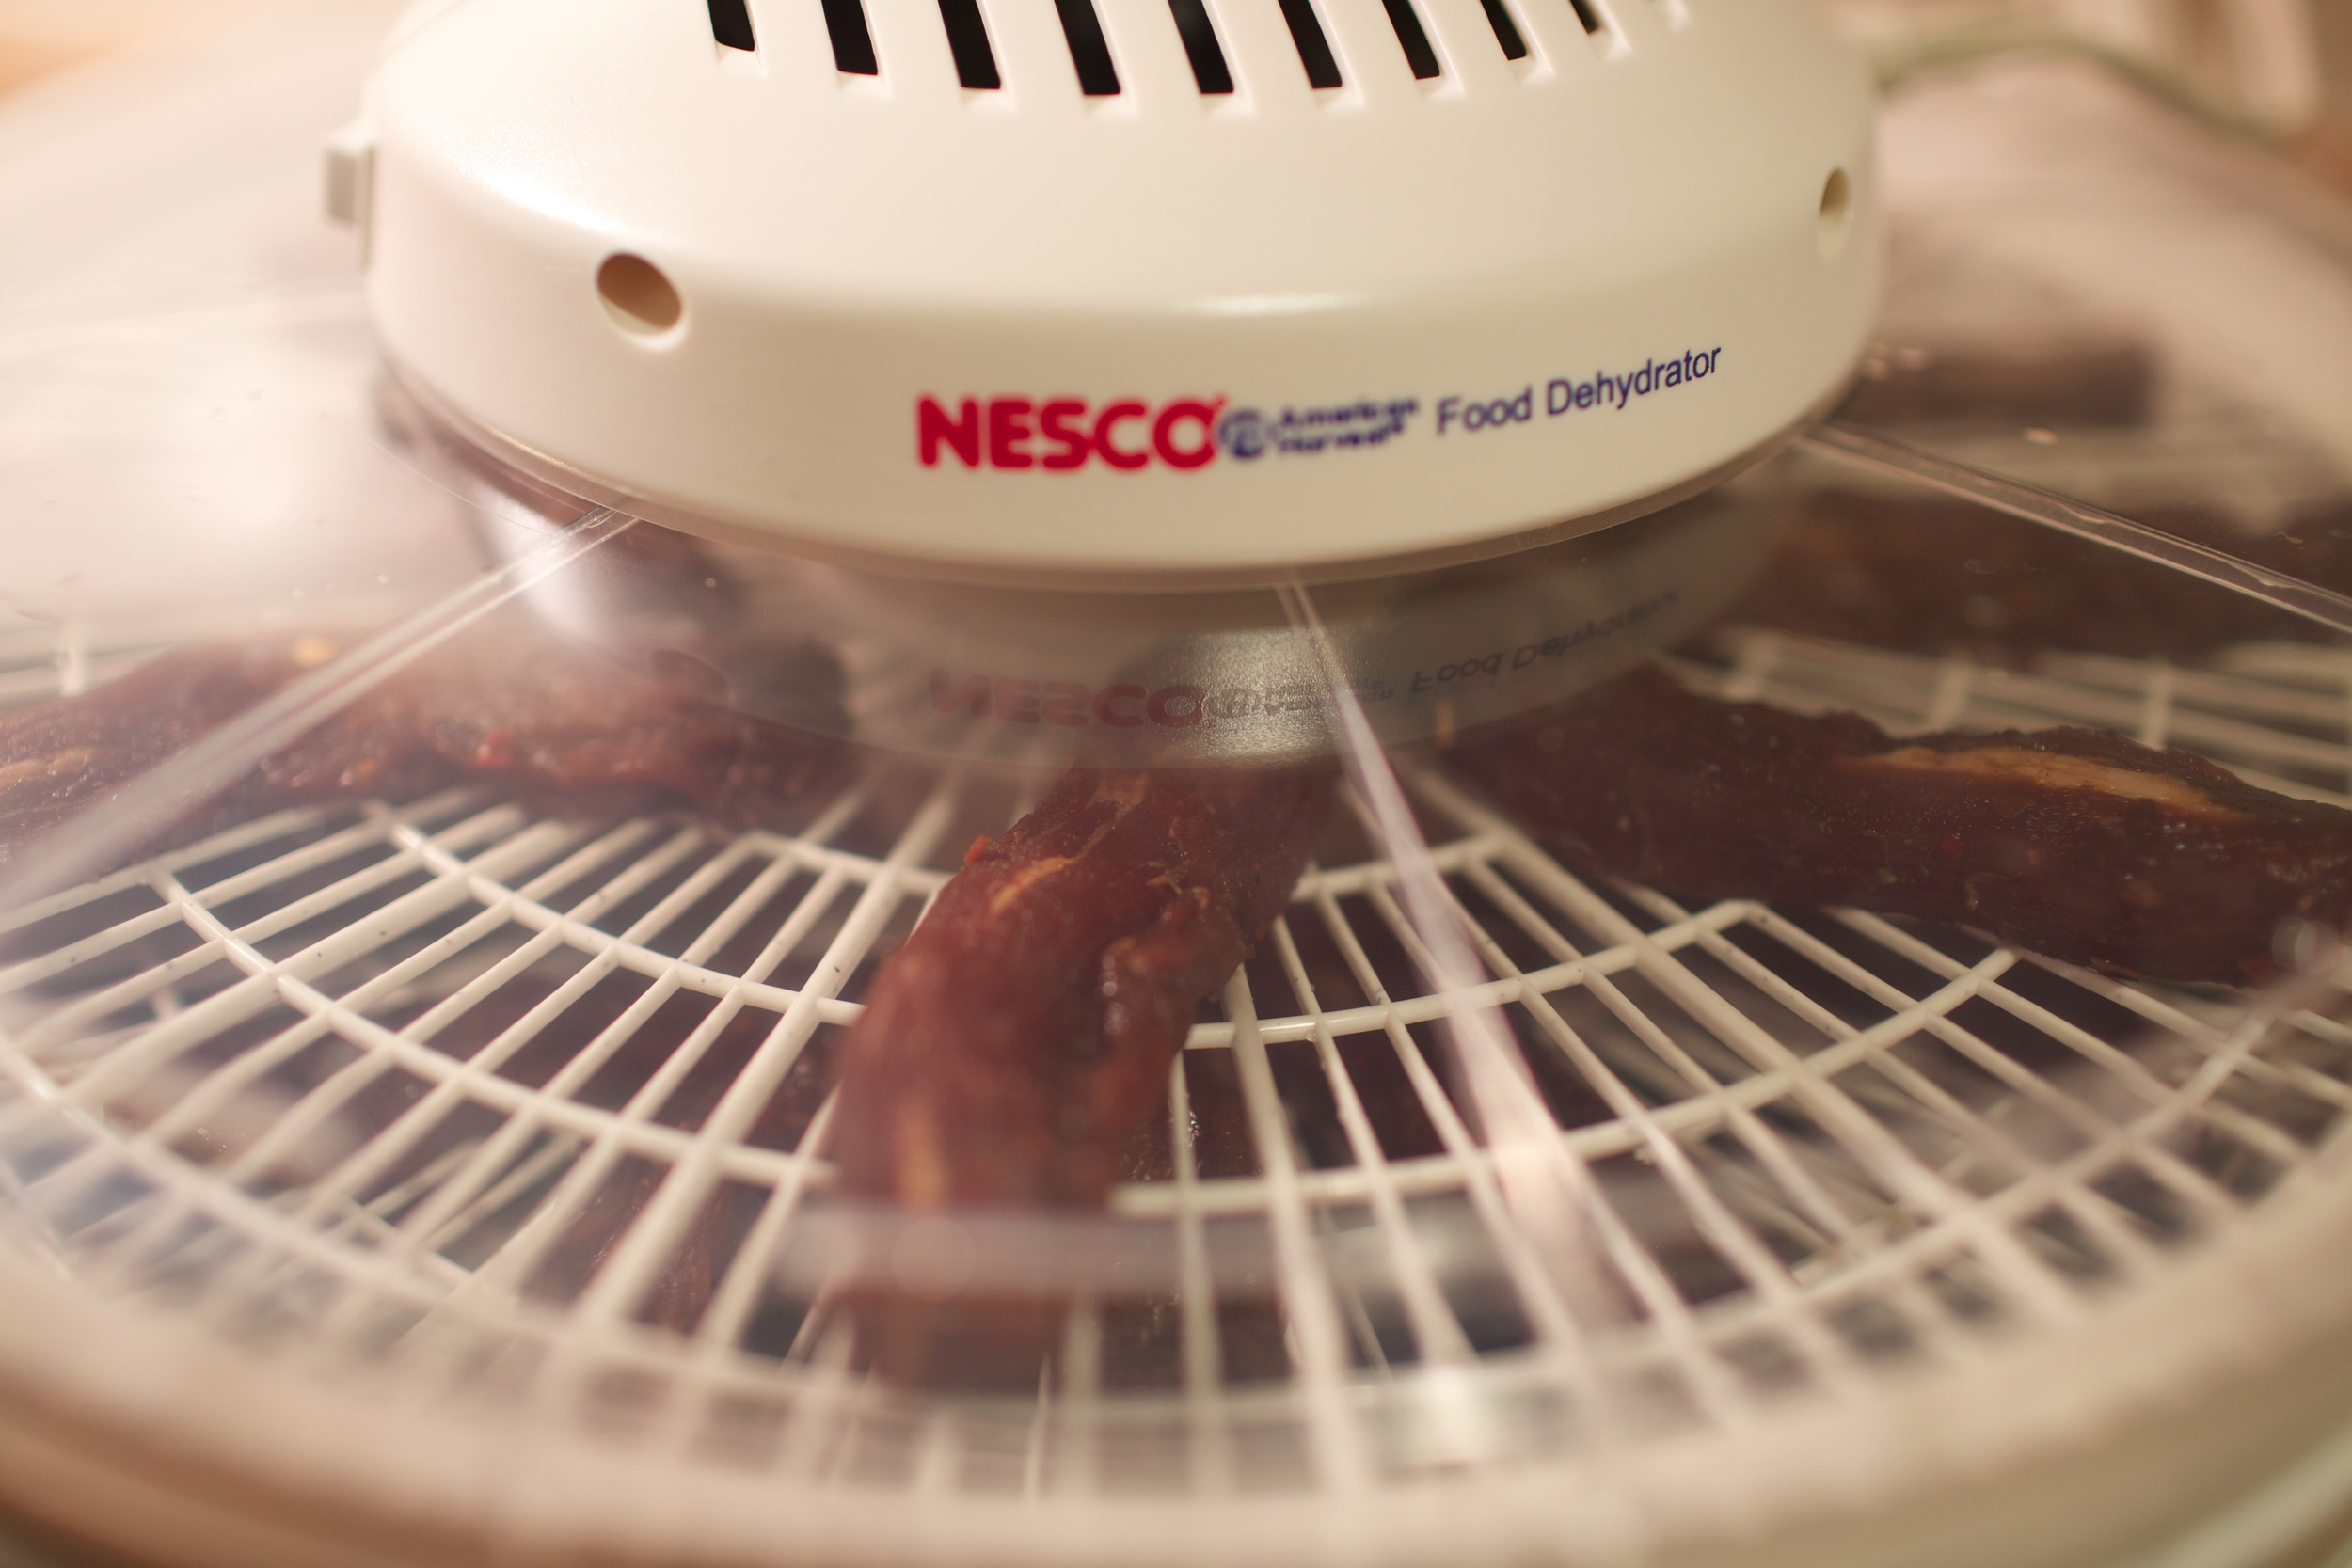 The Nesco food dehydrator on!